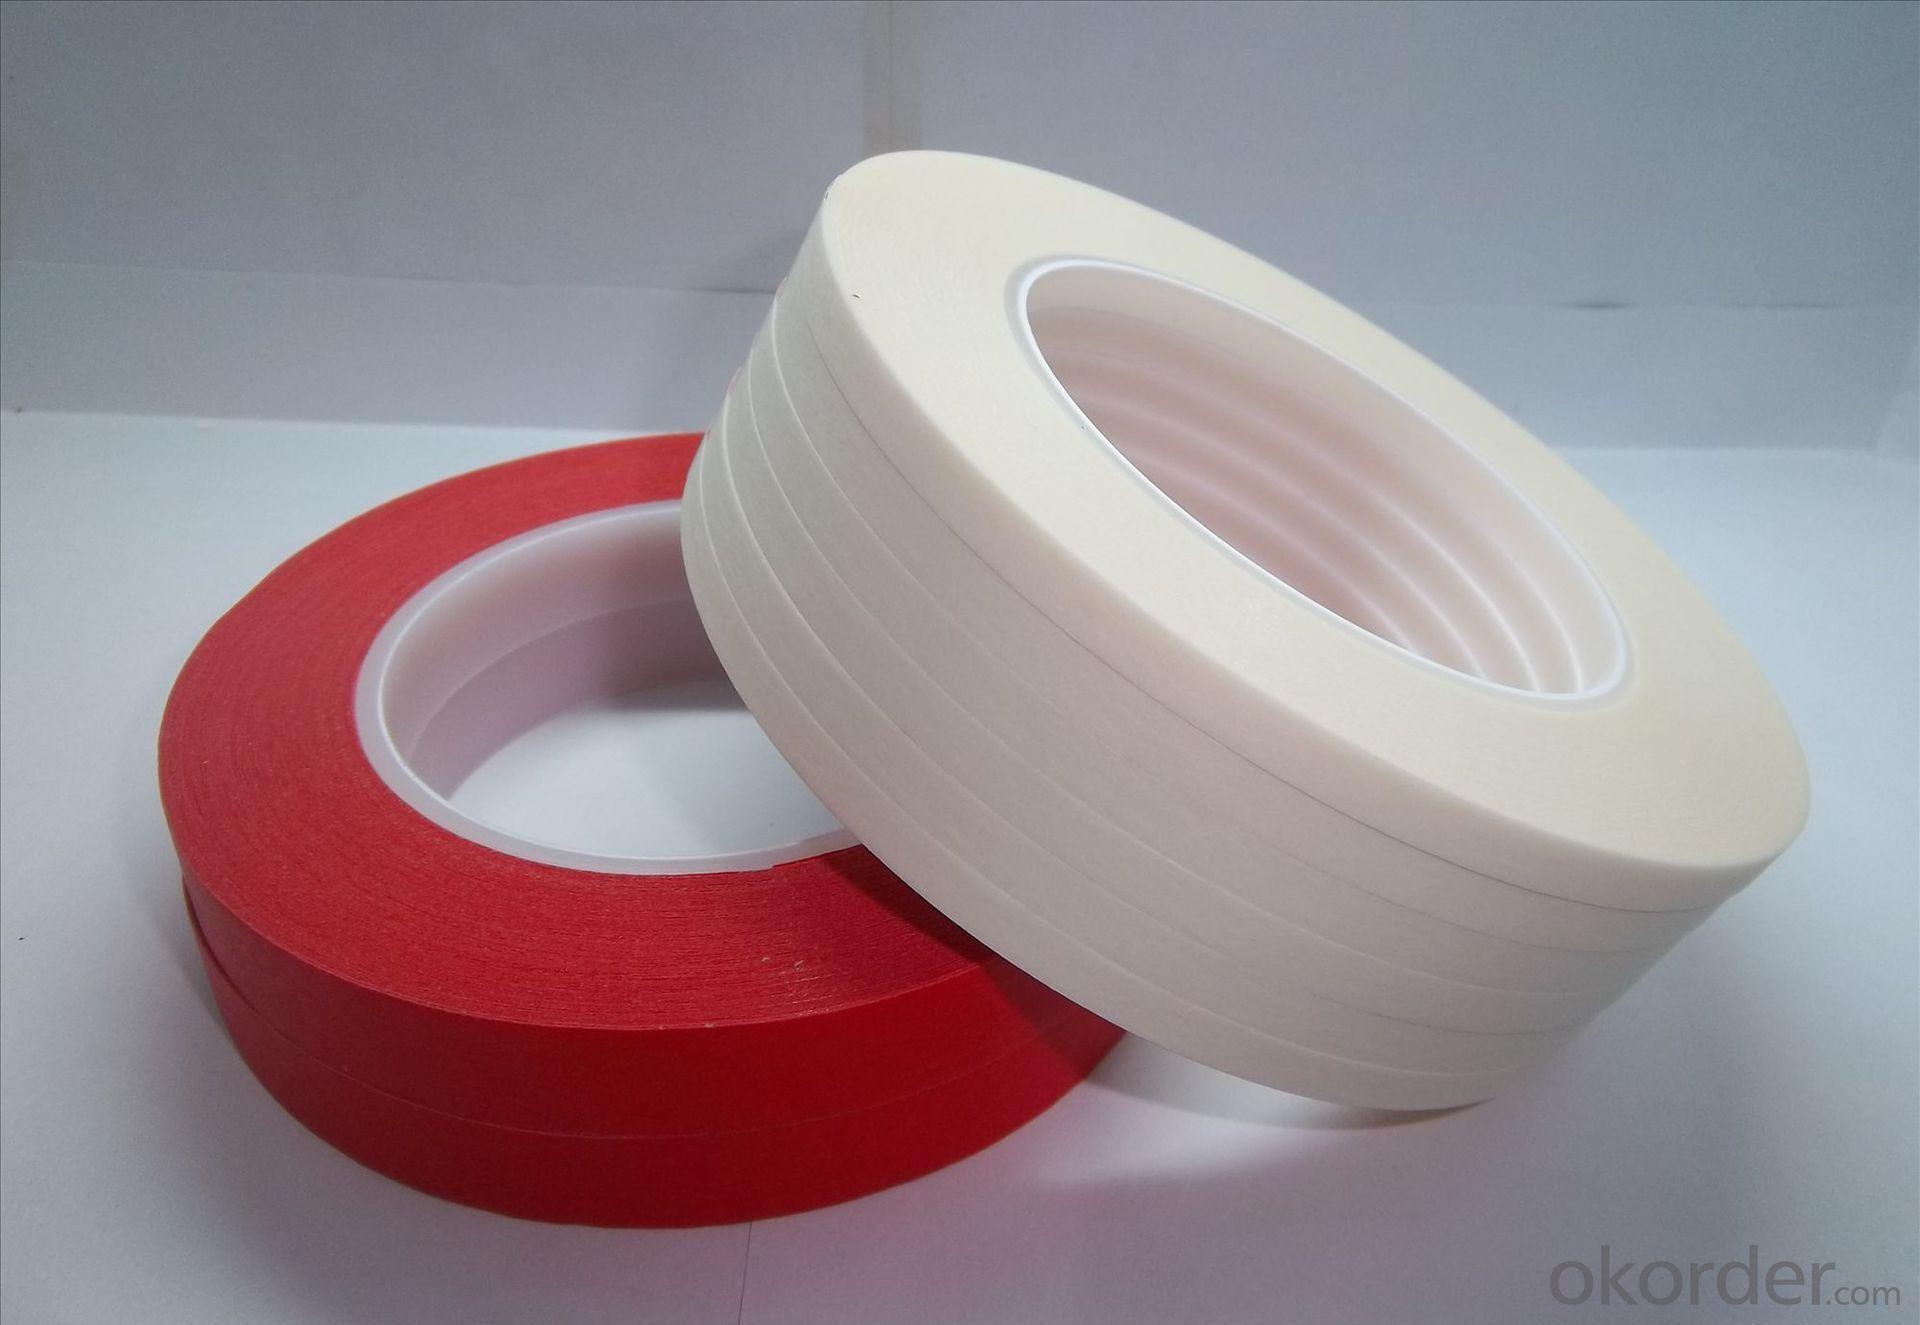 Adhesive Removable Wallpaper Buy Double Sided Foam Tape Waterproof Waterproof 2017